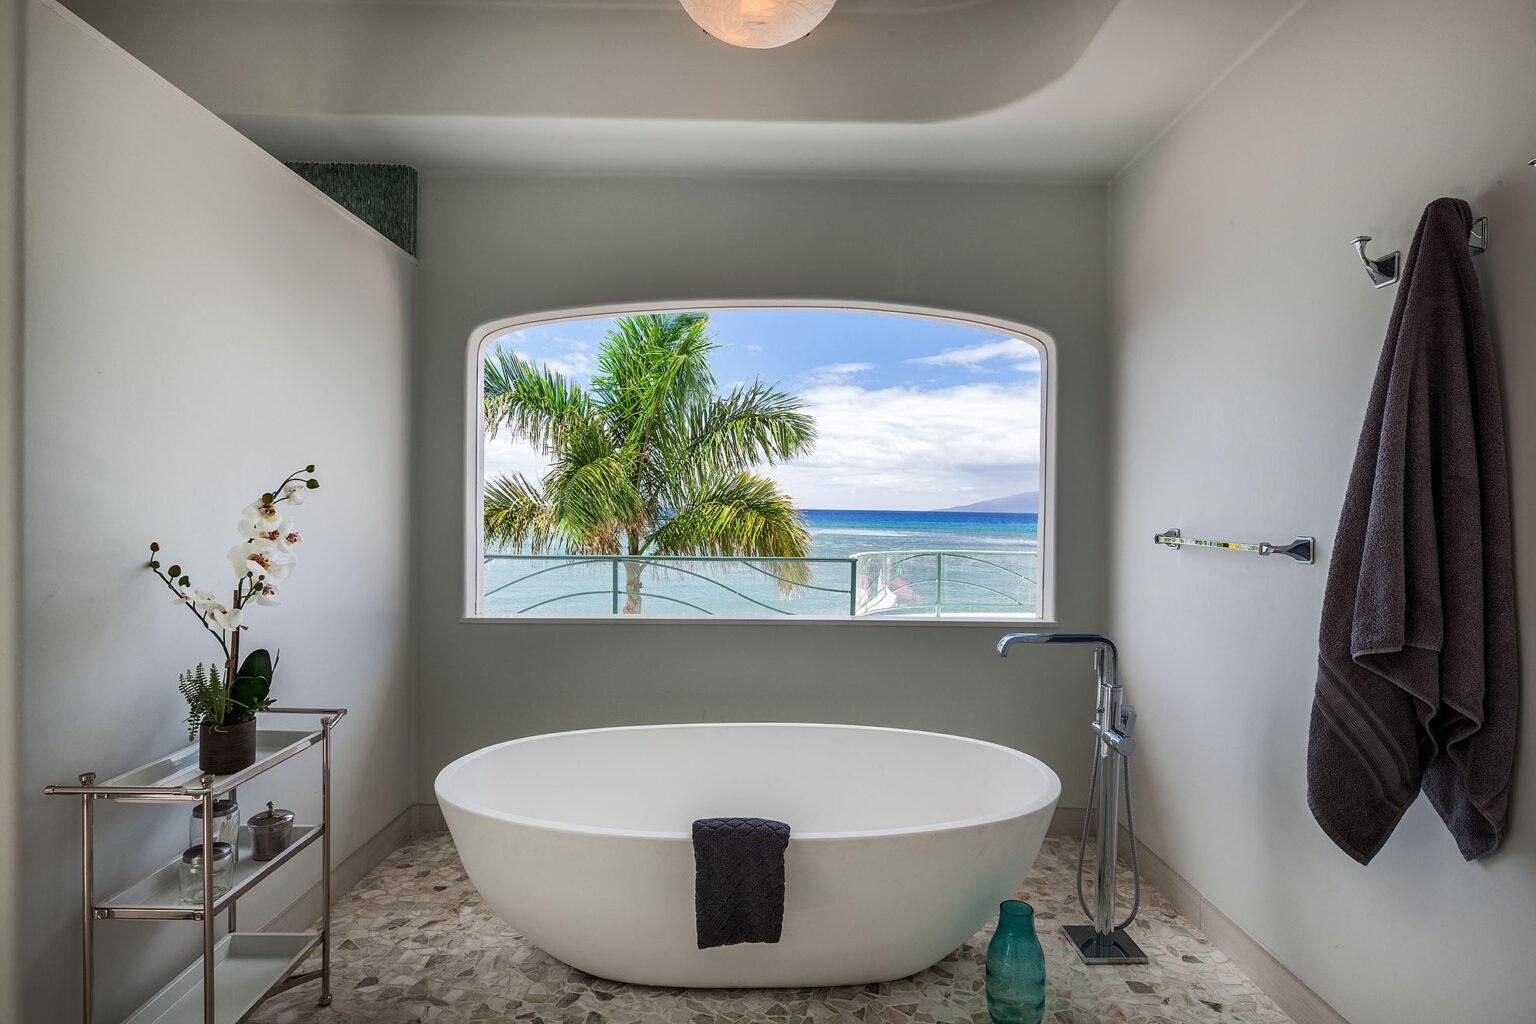 Luxury Real Estate Photo of Bath